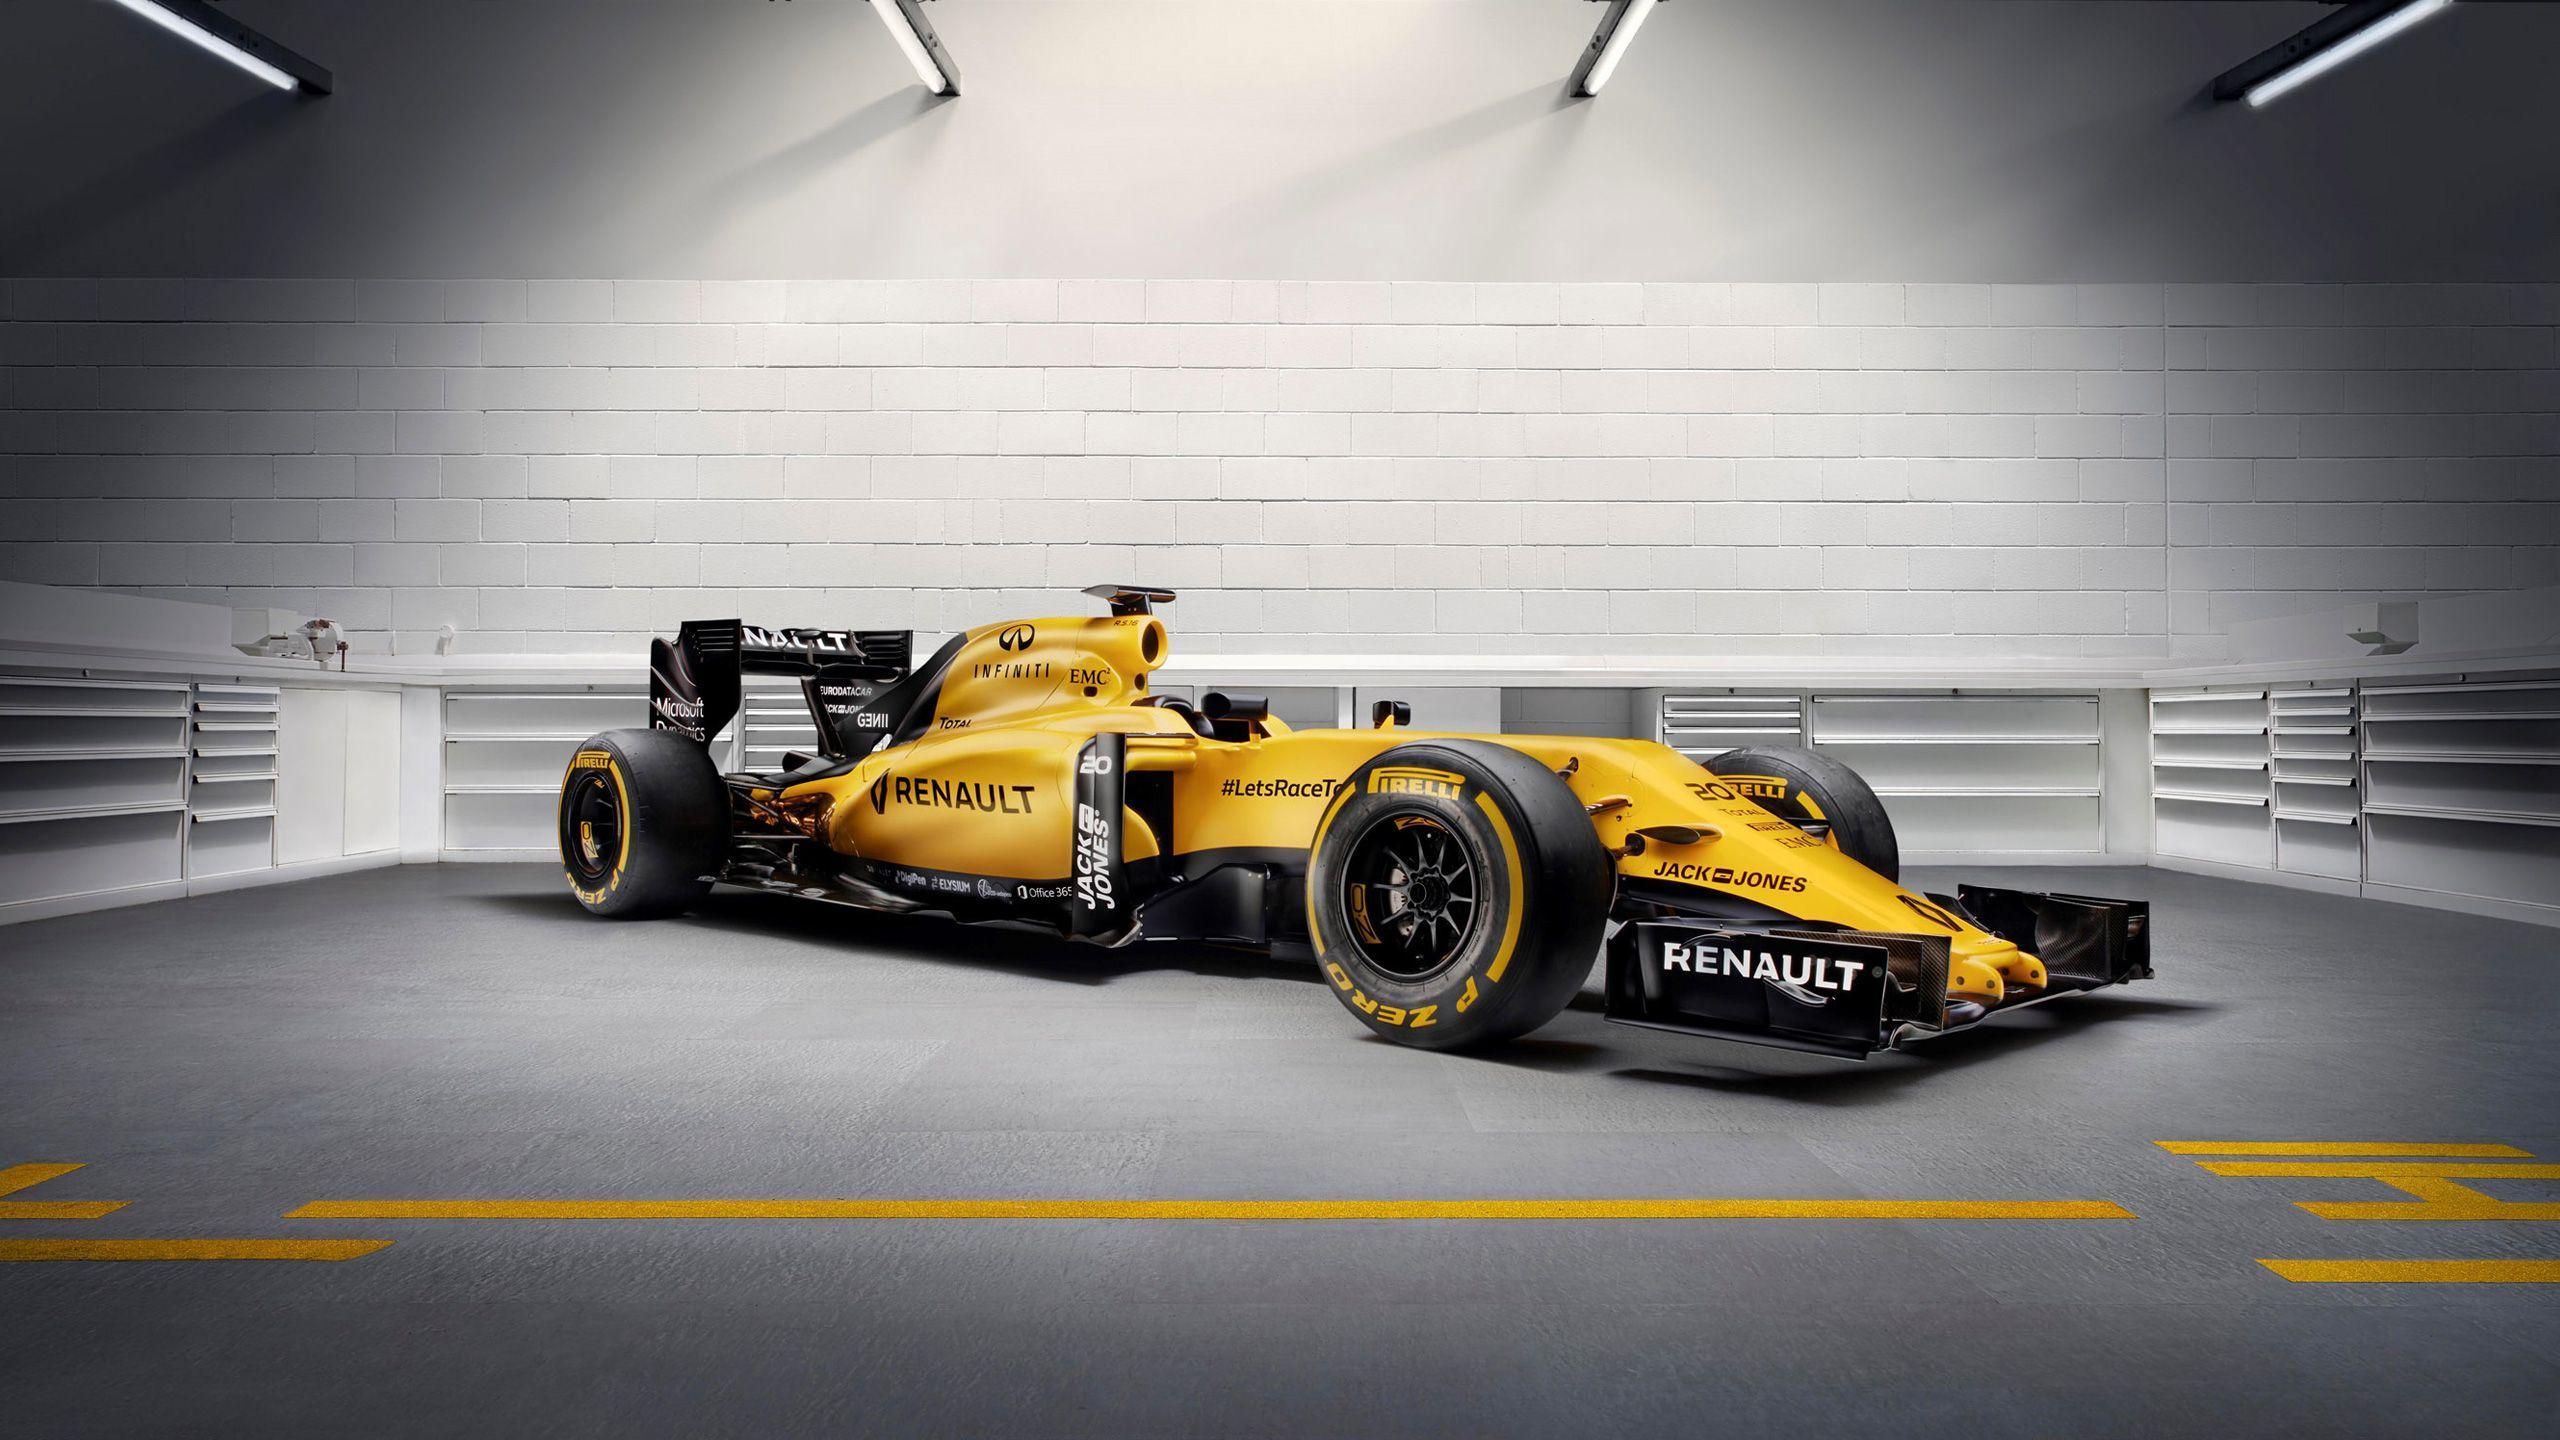 formula 1 sports - photo #31